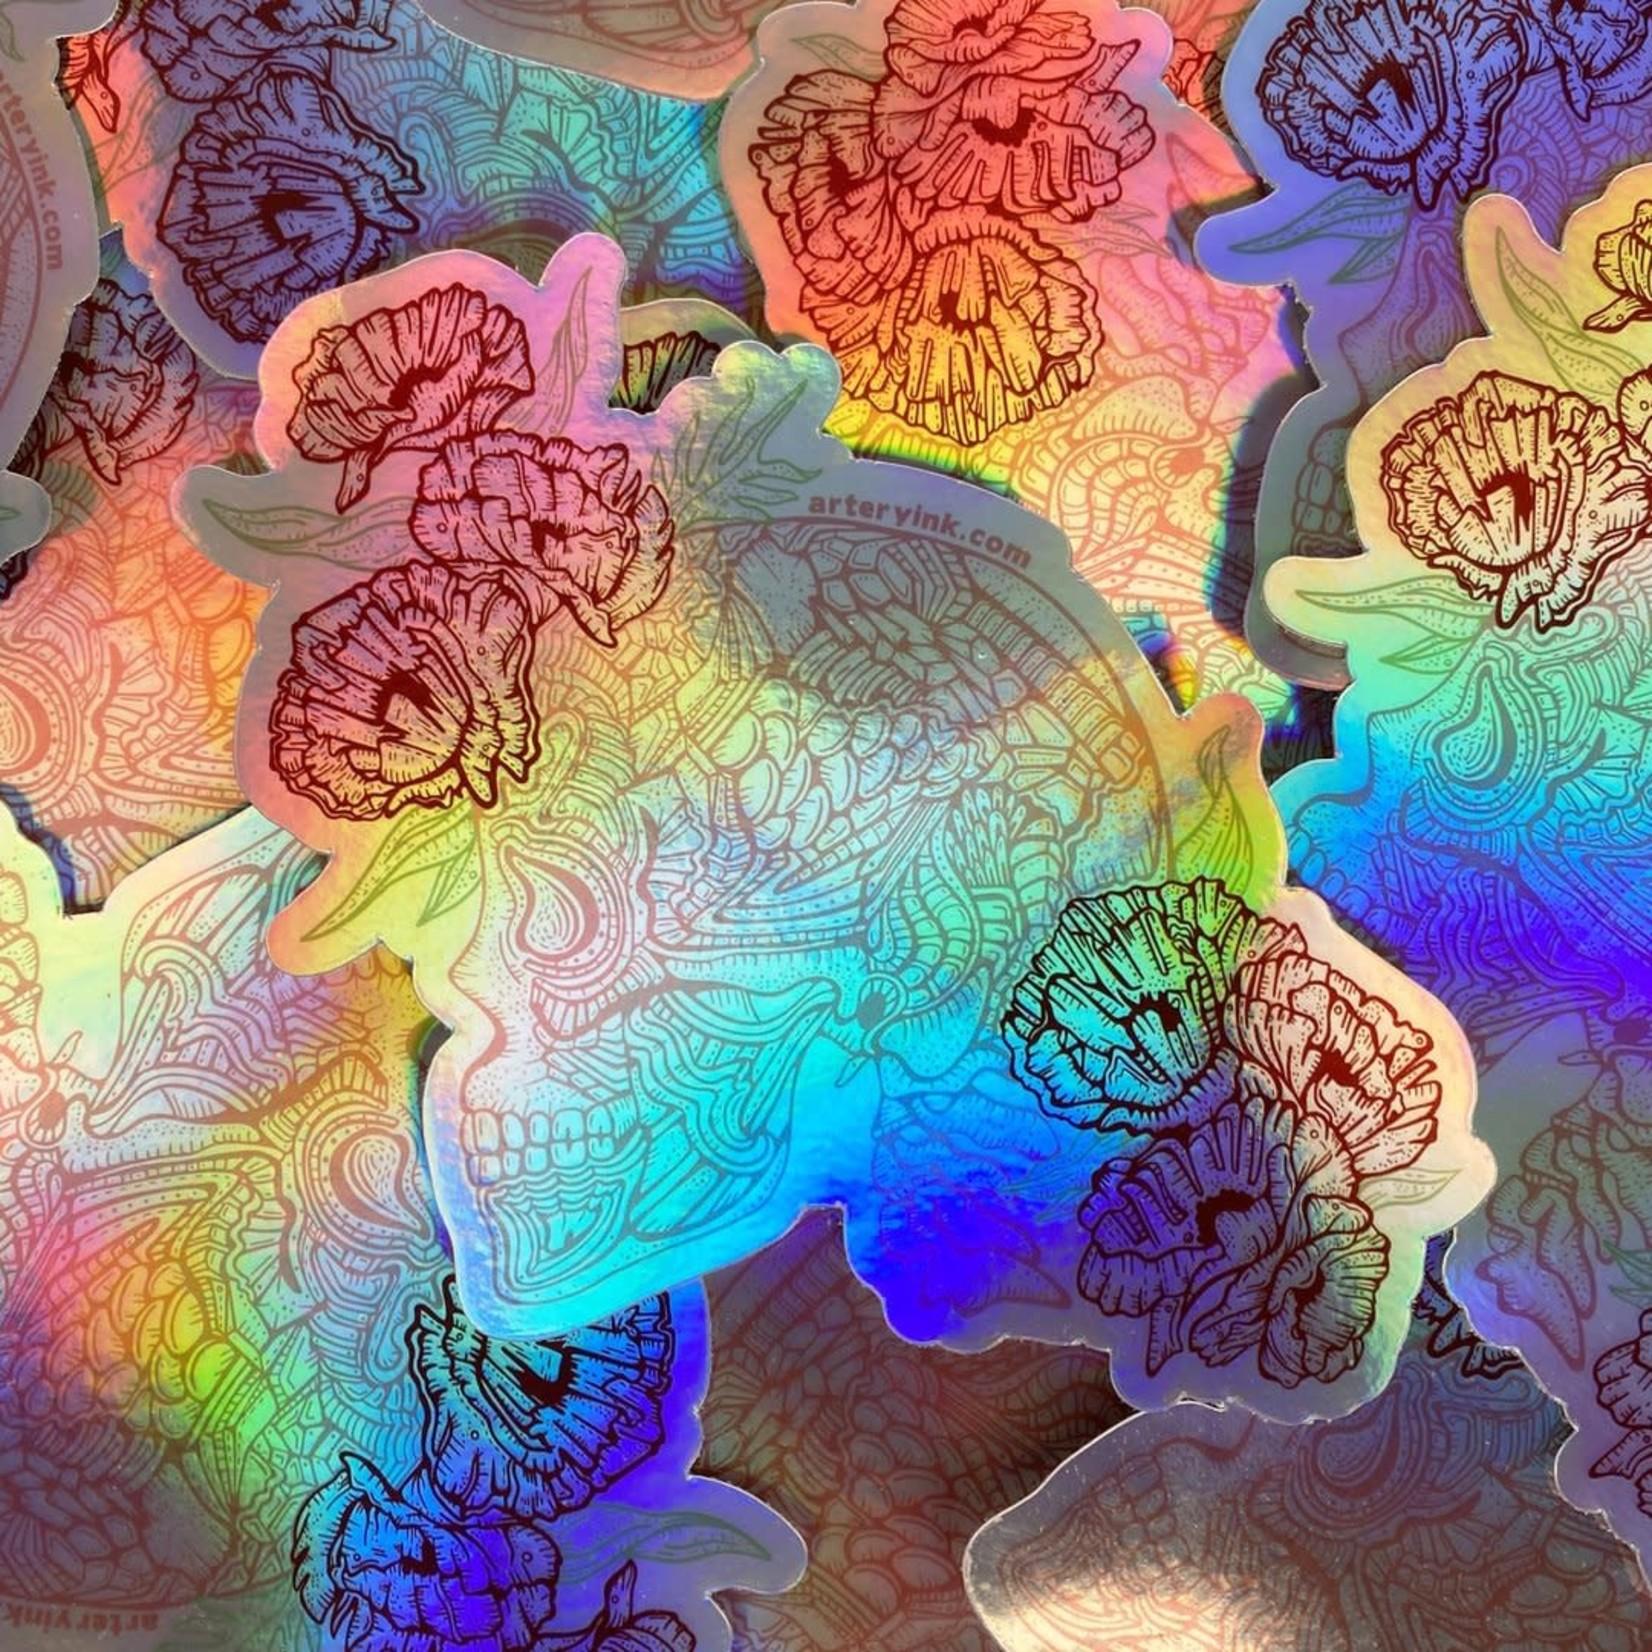 Artery Ink (LO) Skull & Flowers Hologram Sticker